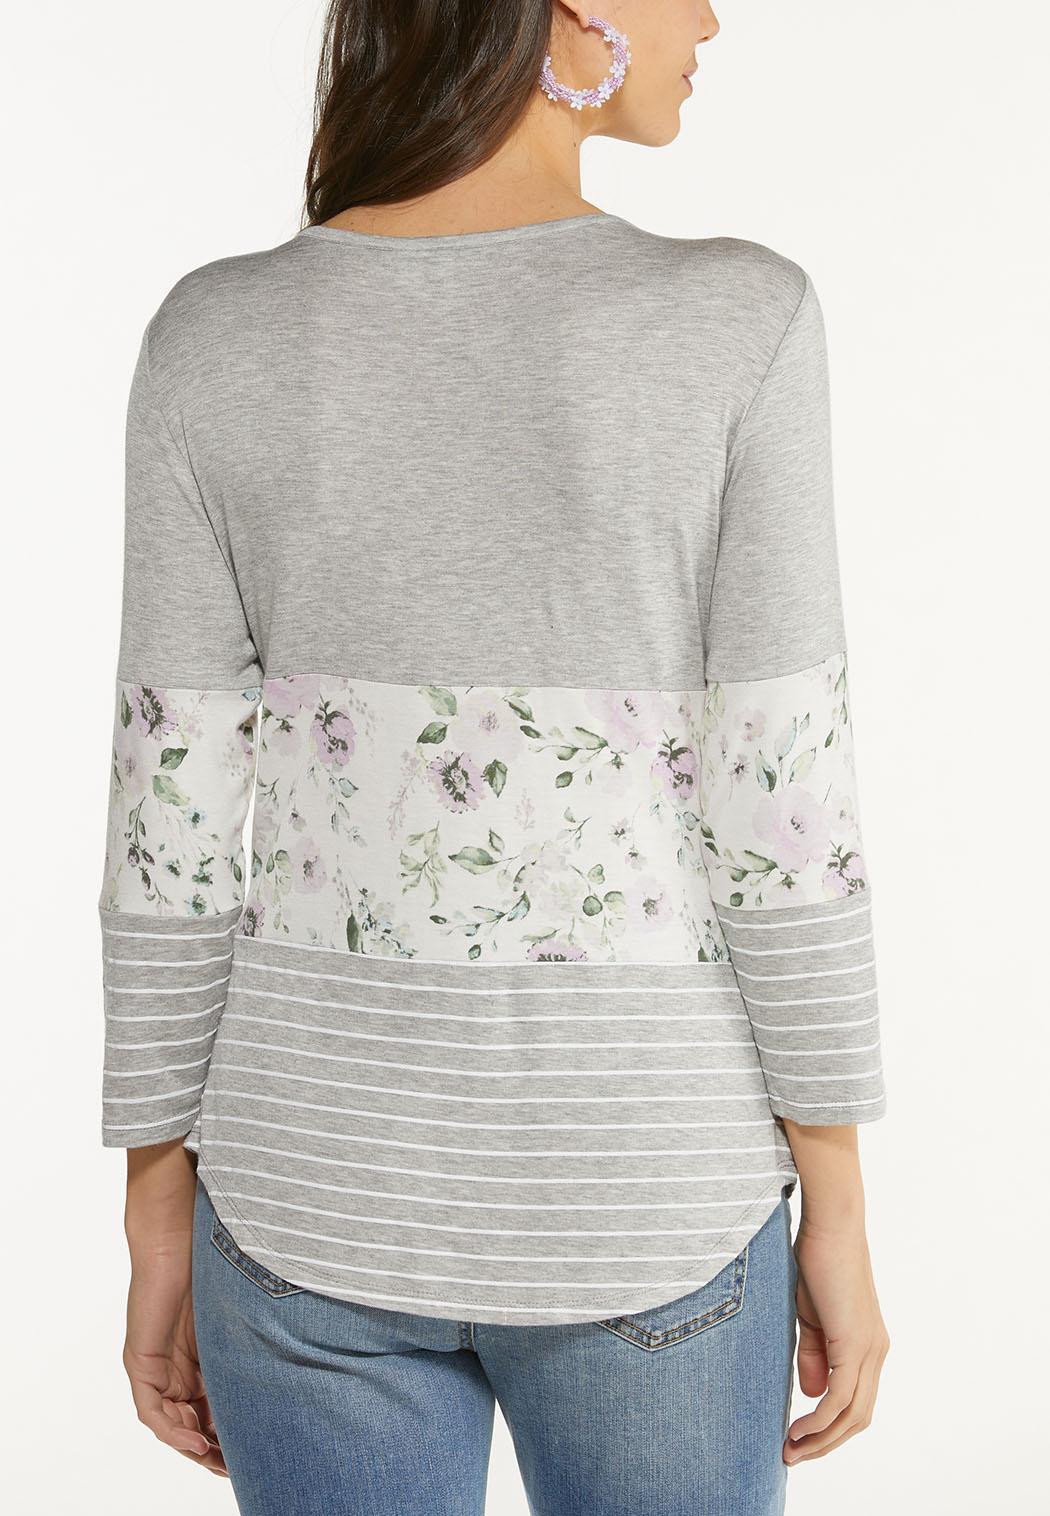 Lavender Floral Colorblock Top (Item #44520355)